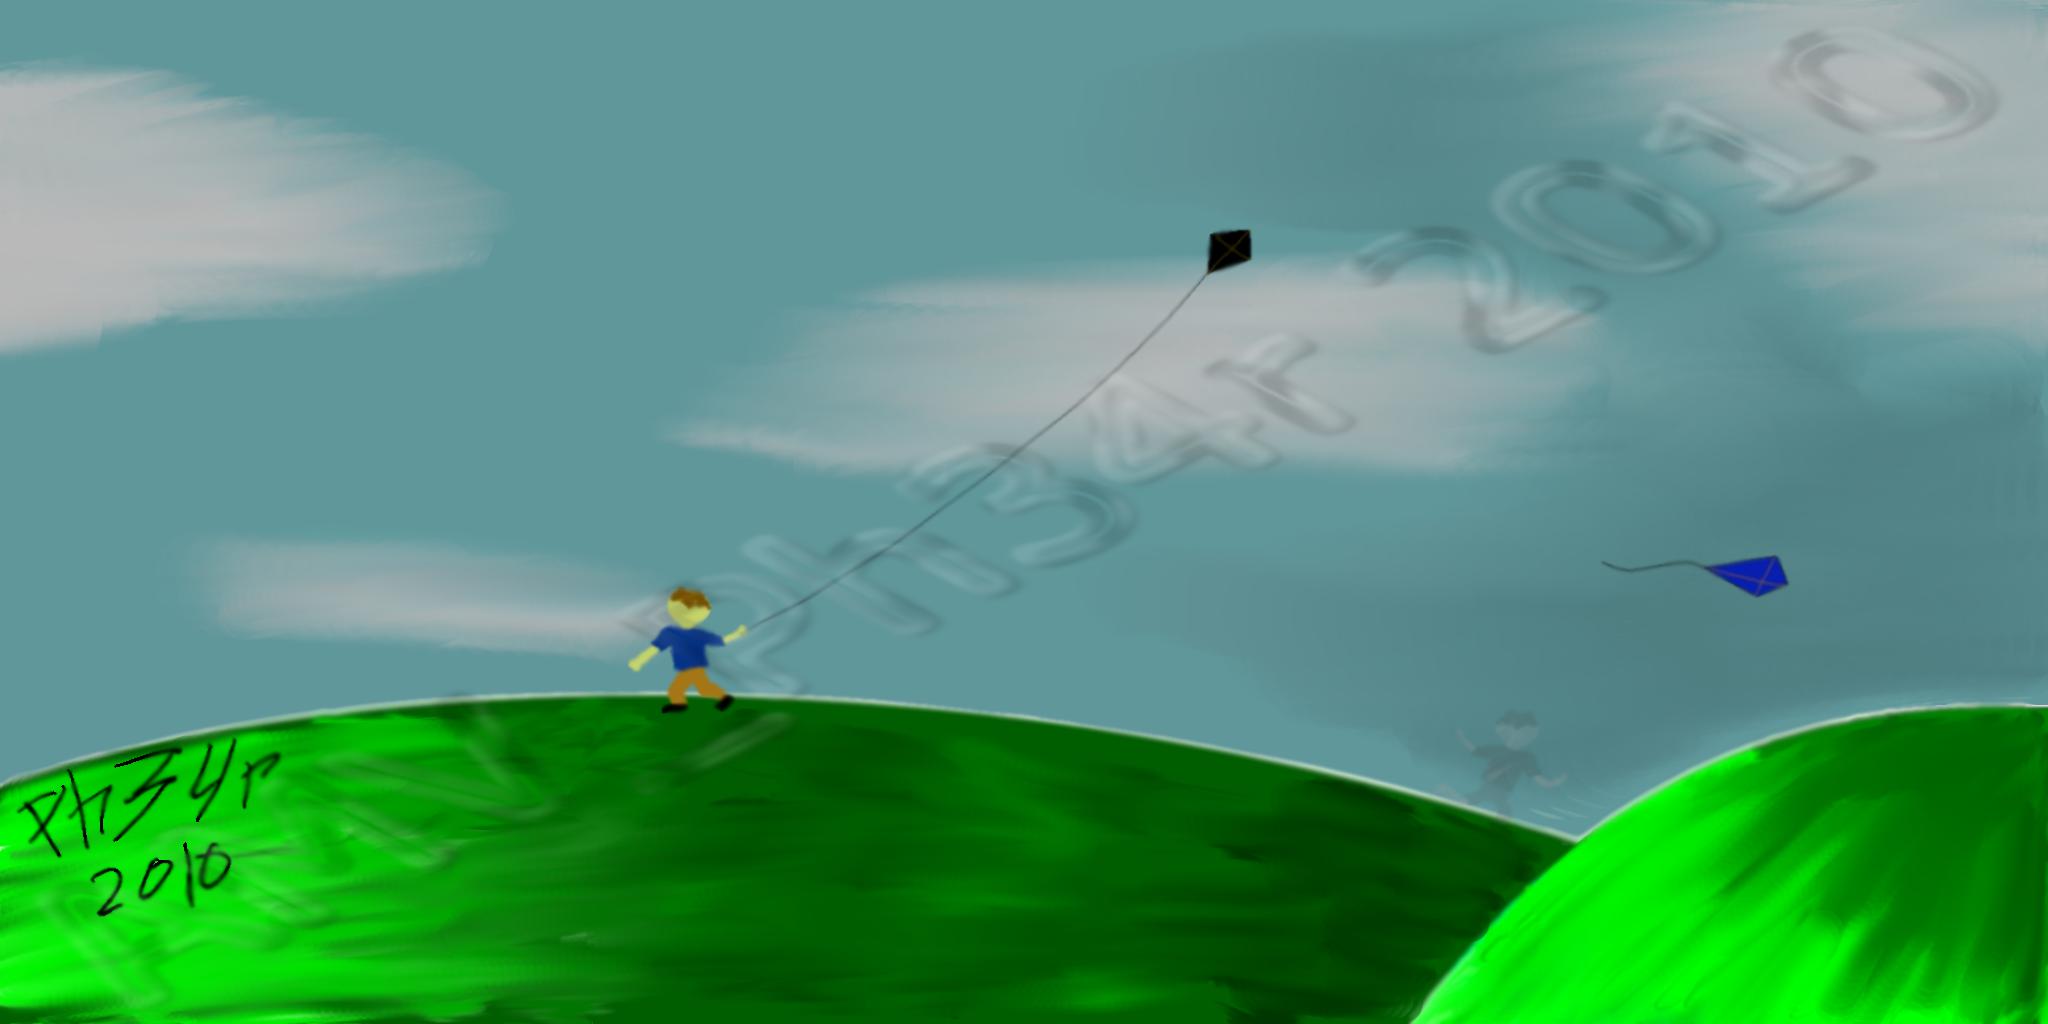 khaled hosseini the kite runner free download pdf